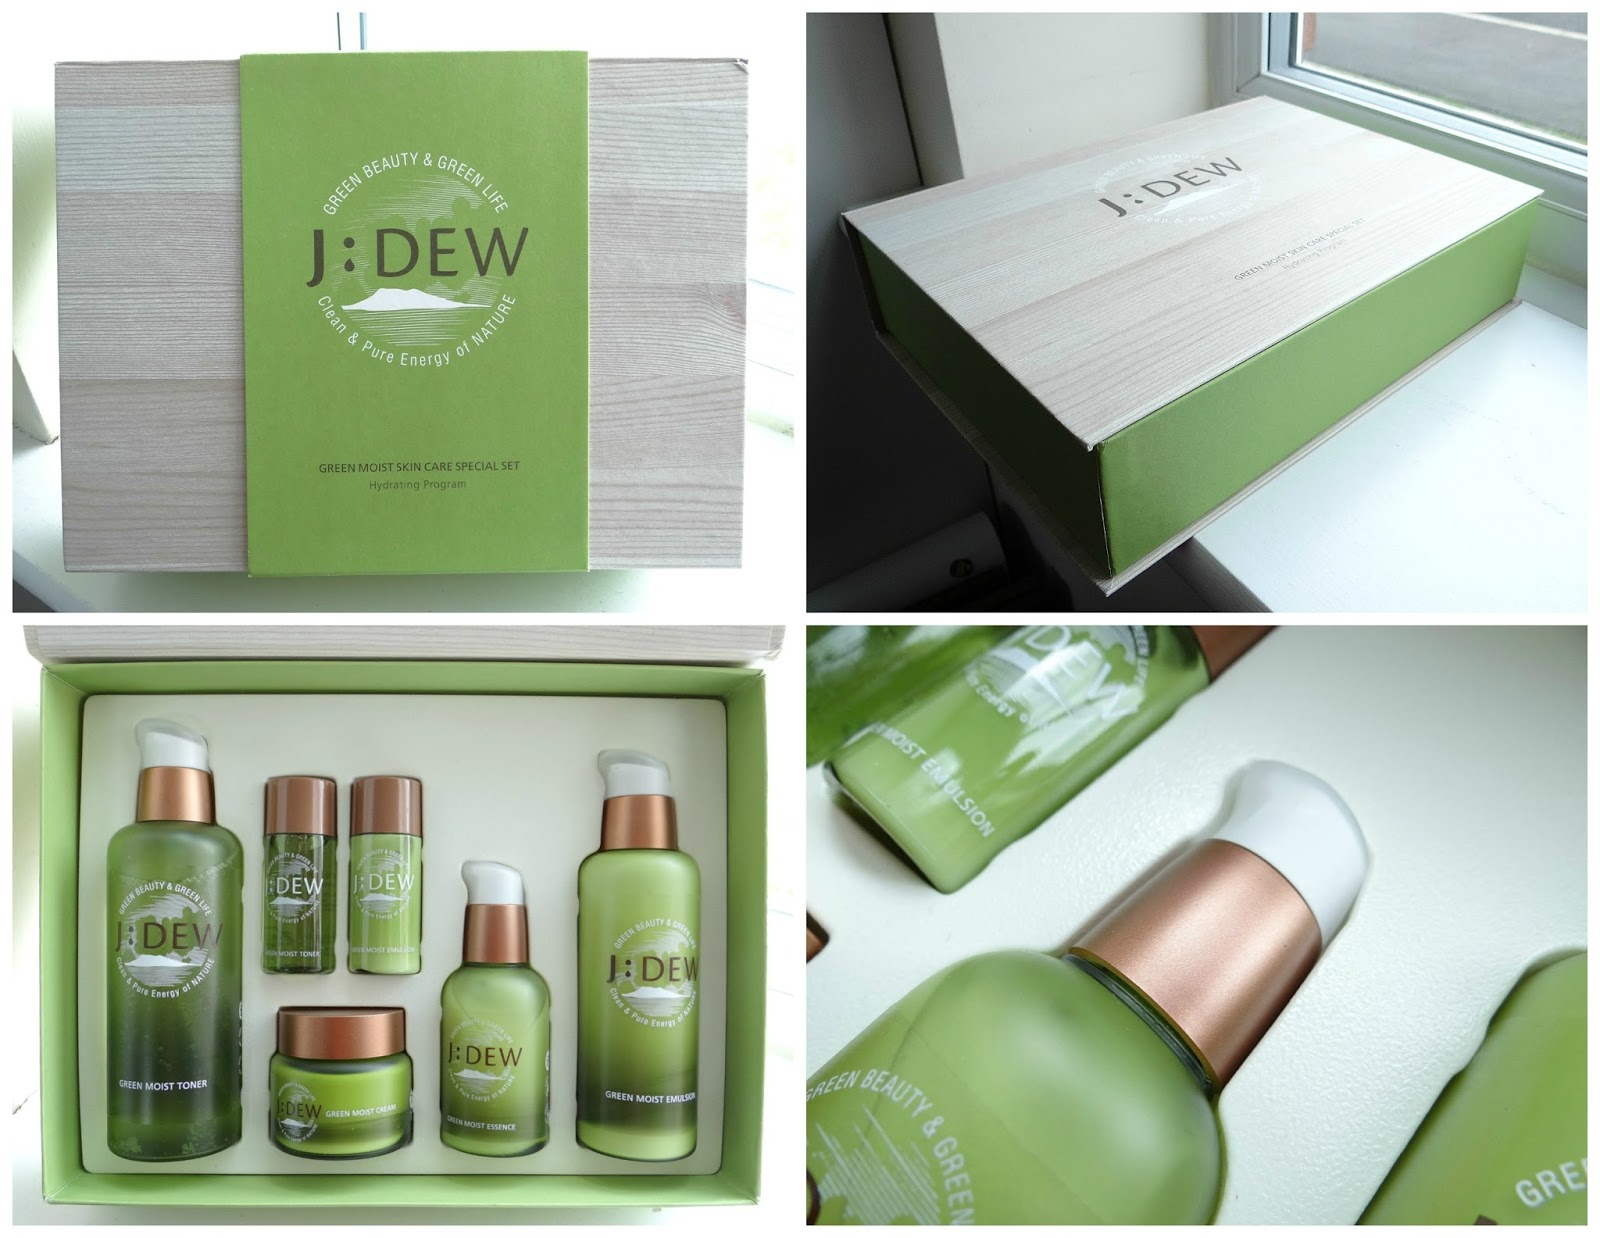 Q-depot online Korean cosmetics store review, J'Ders Korean Cosmetcis brand, J:Dew Green Moist